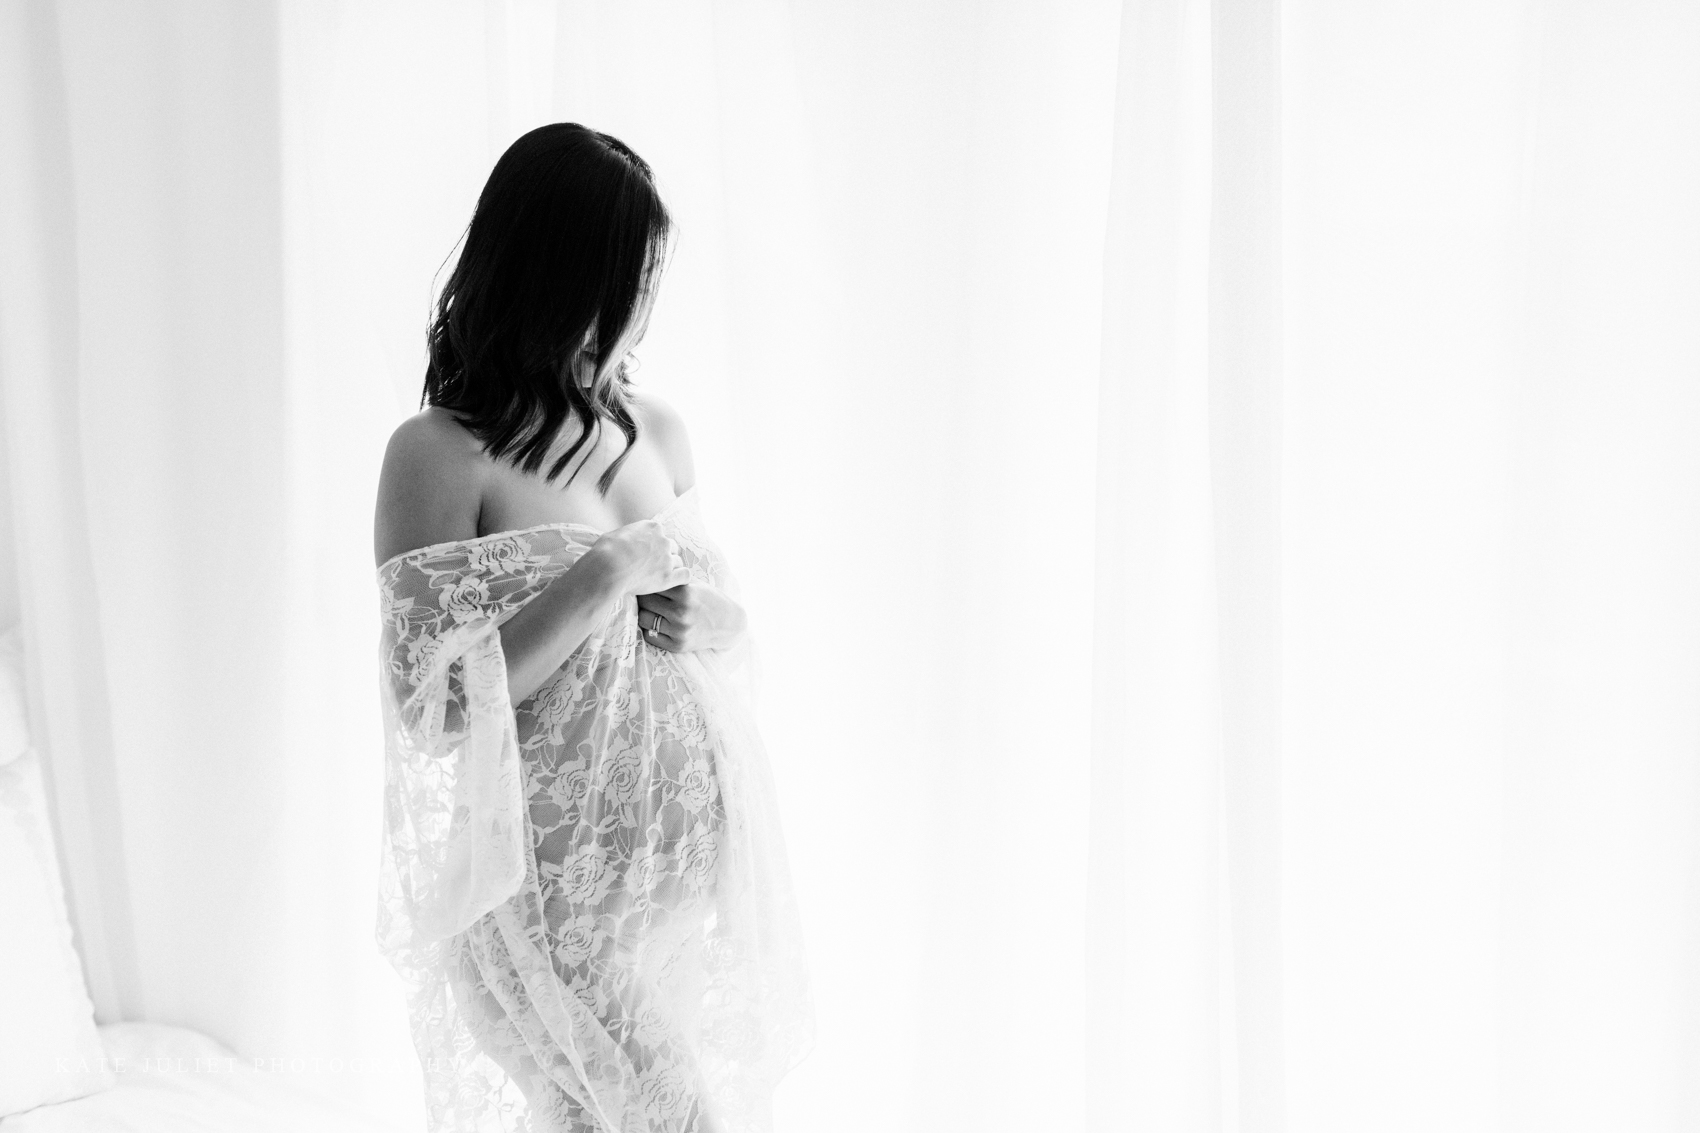 kate_juliet_photography-maternity-web-56.jpg